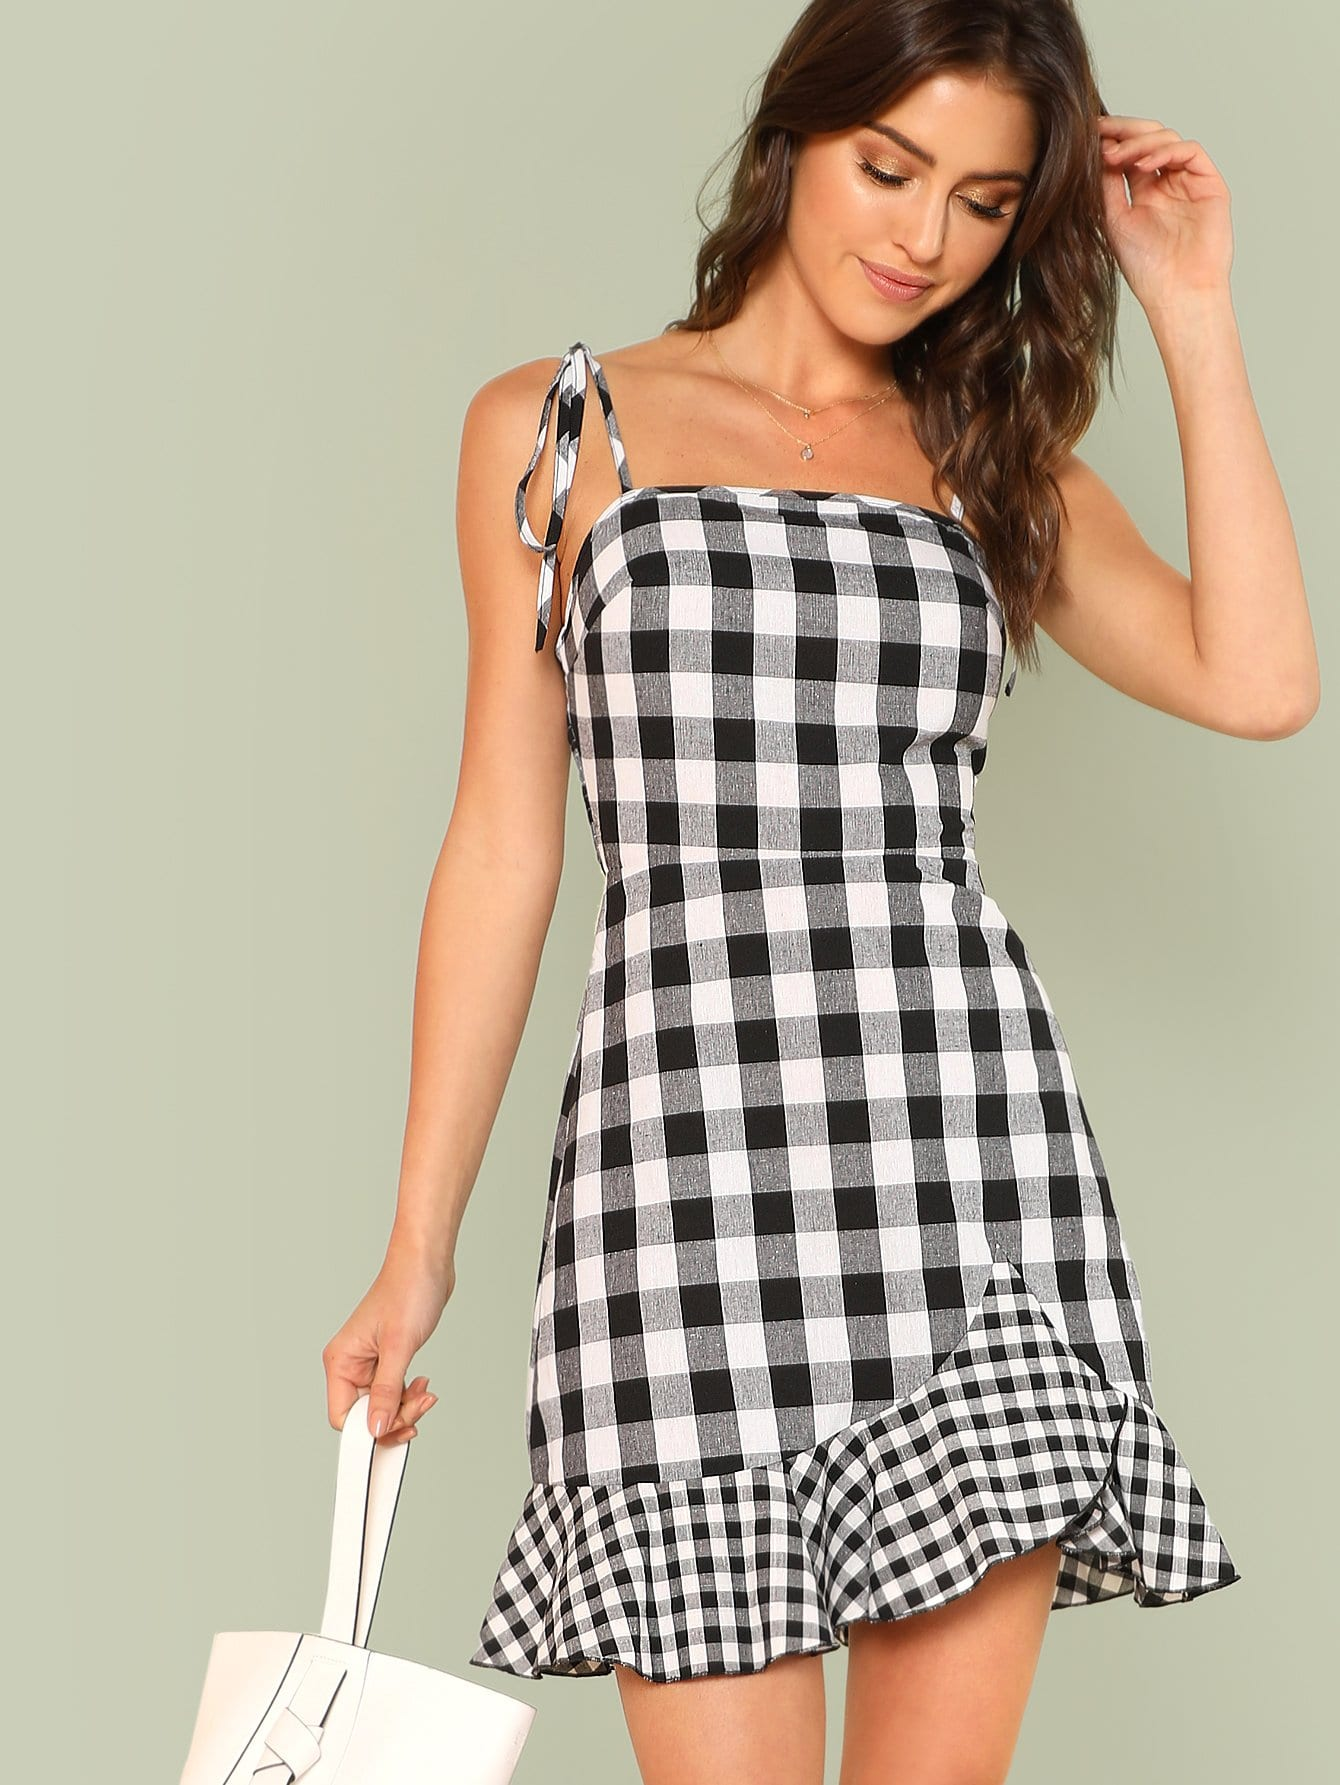 Asymmetrical Ruffle Hem Gingham Tied Cami Dress wrap front tied v back ruffle hem dress